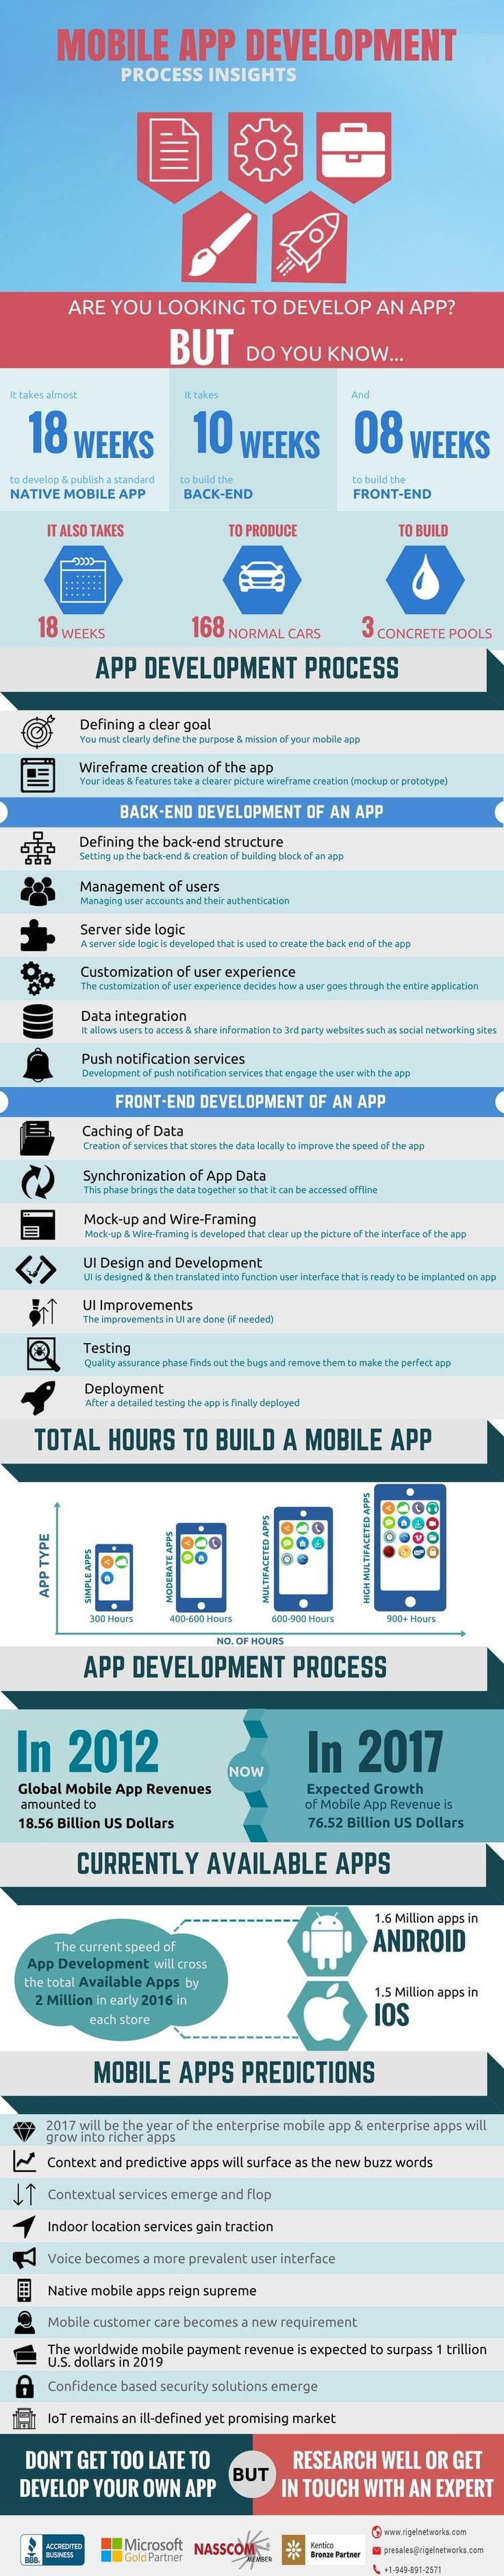 Mobile App Development Process of Insights